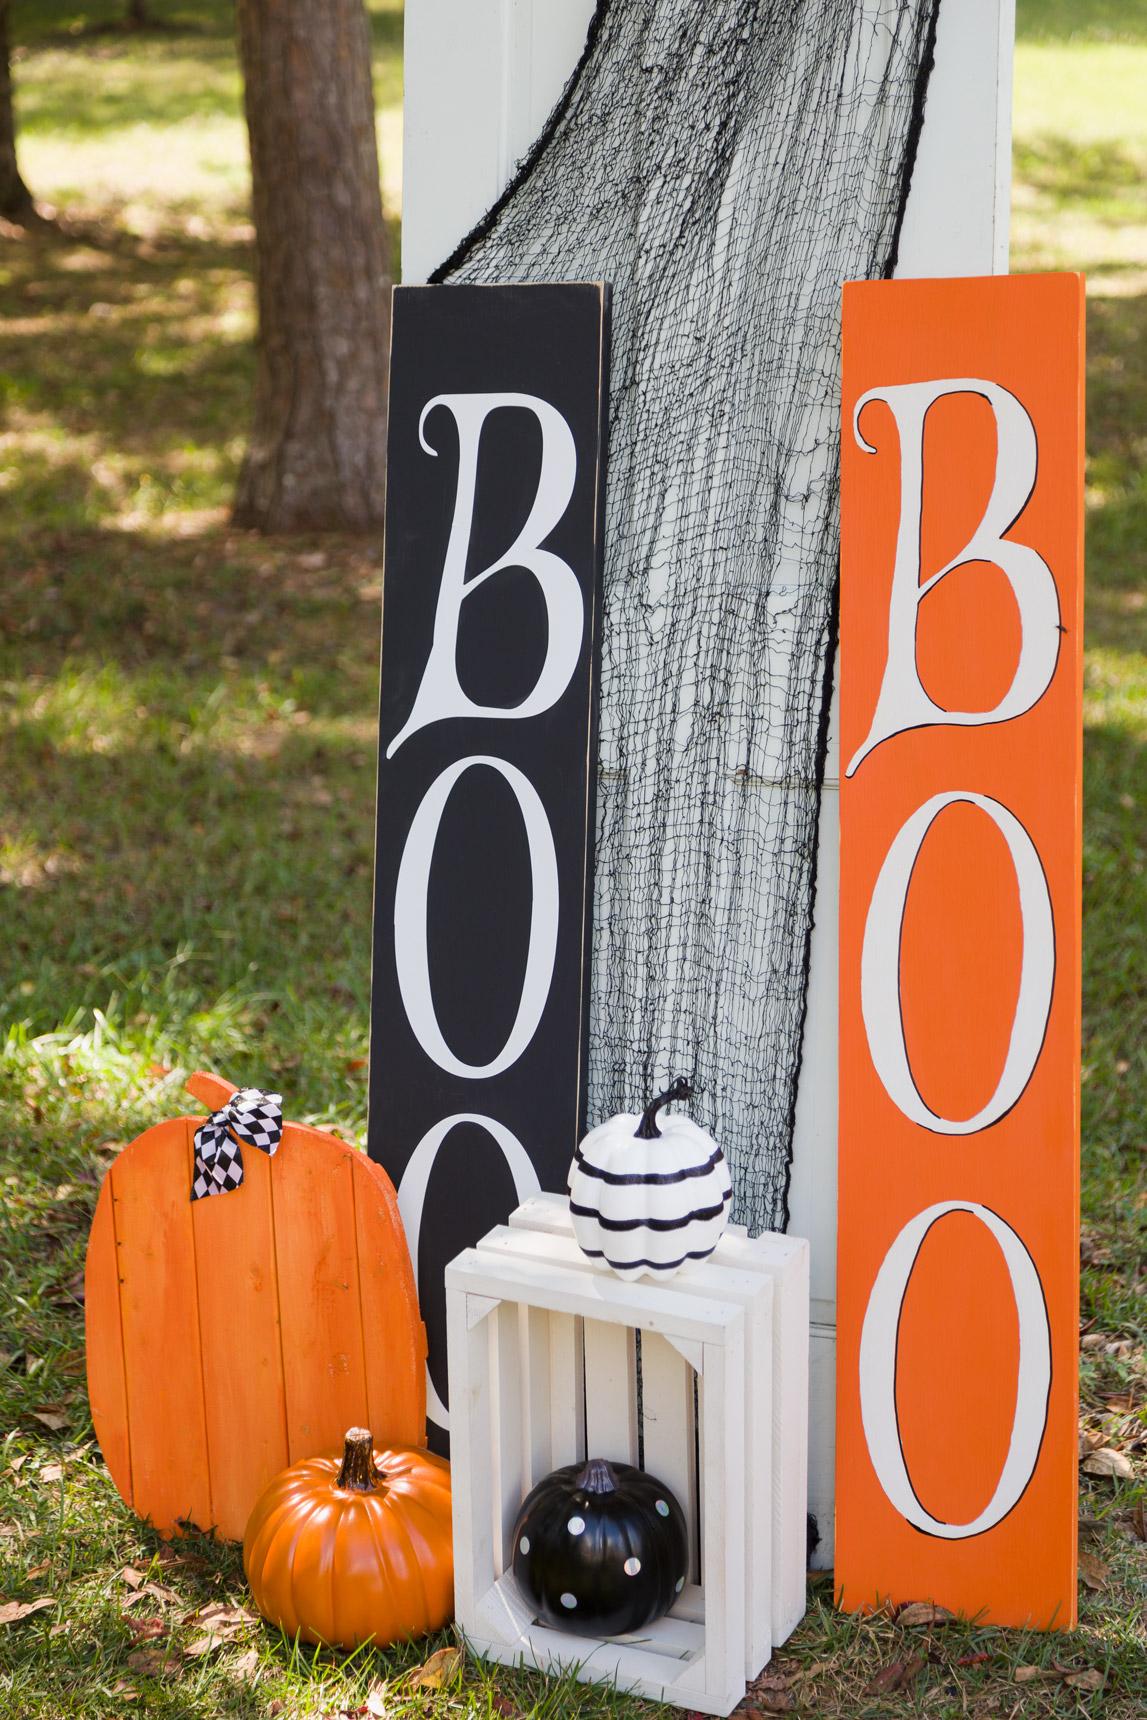 Halloween signs and pumpkins